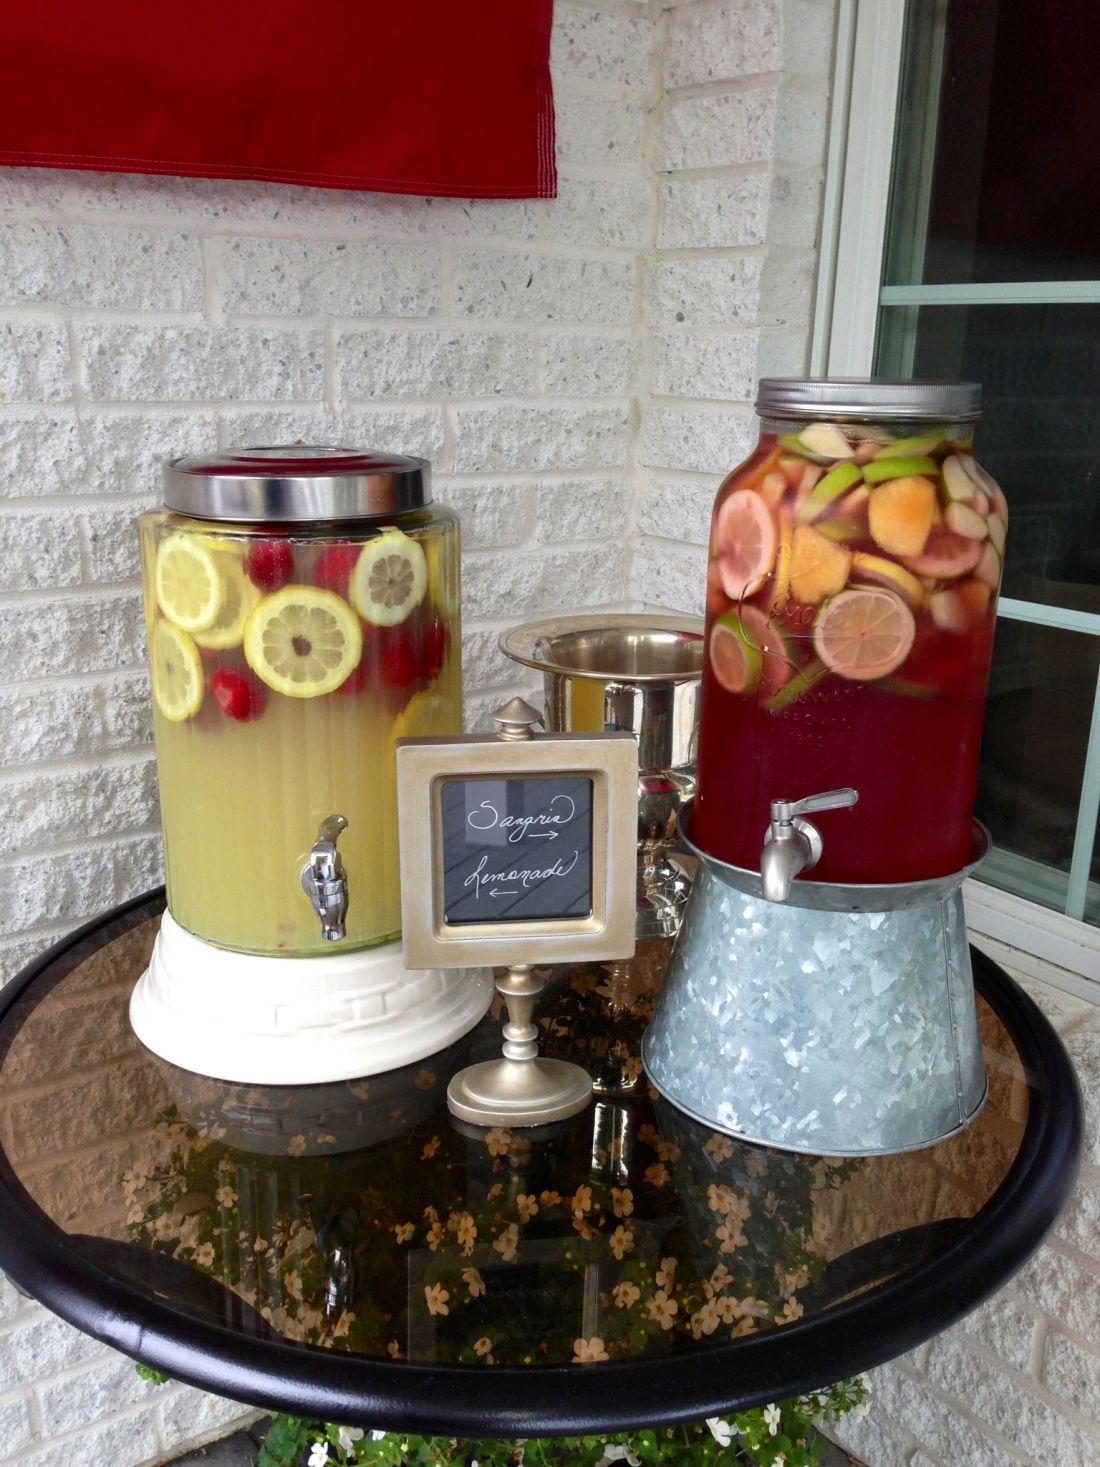 Decor graduation decoration ideas with orange drink as the main menu